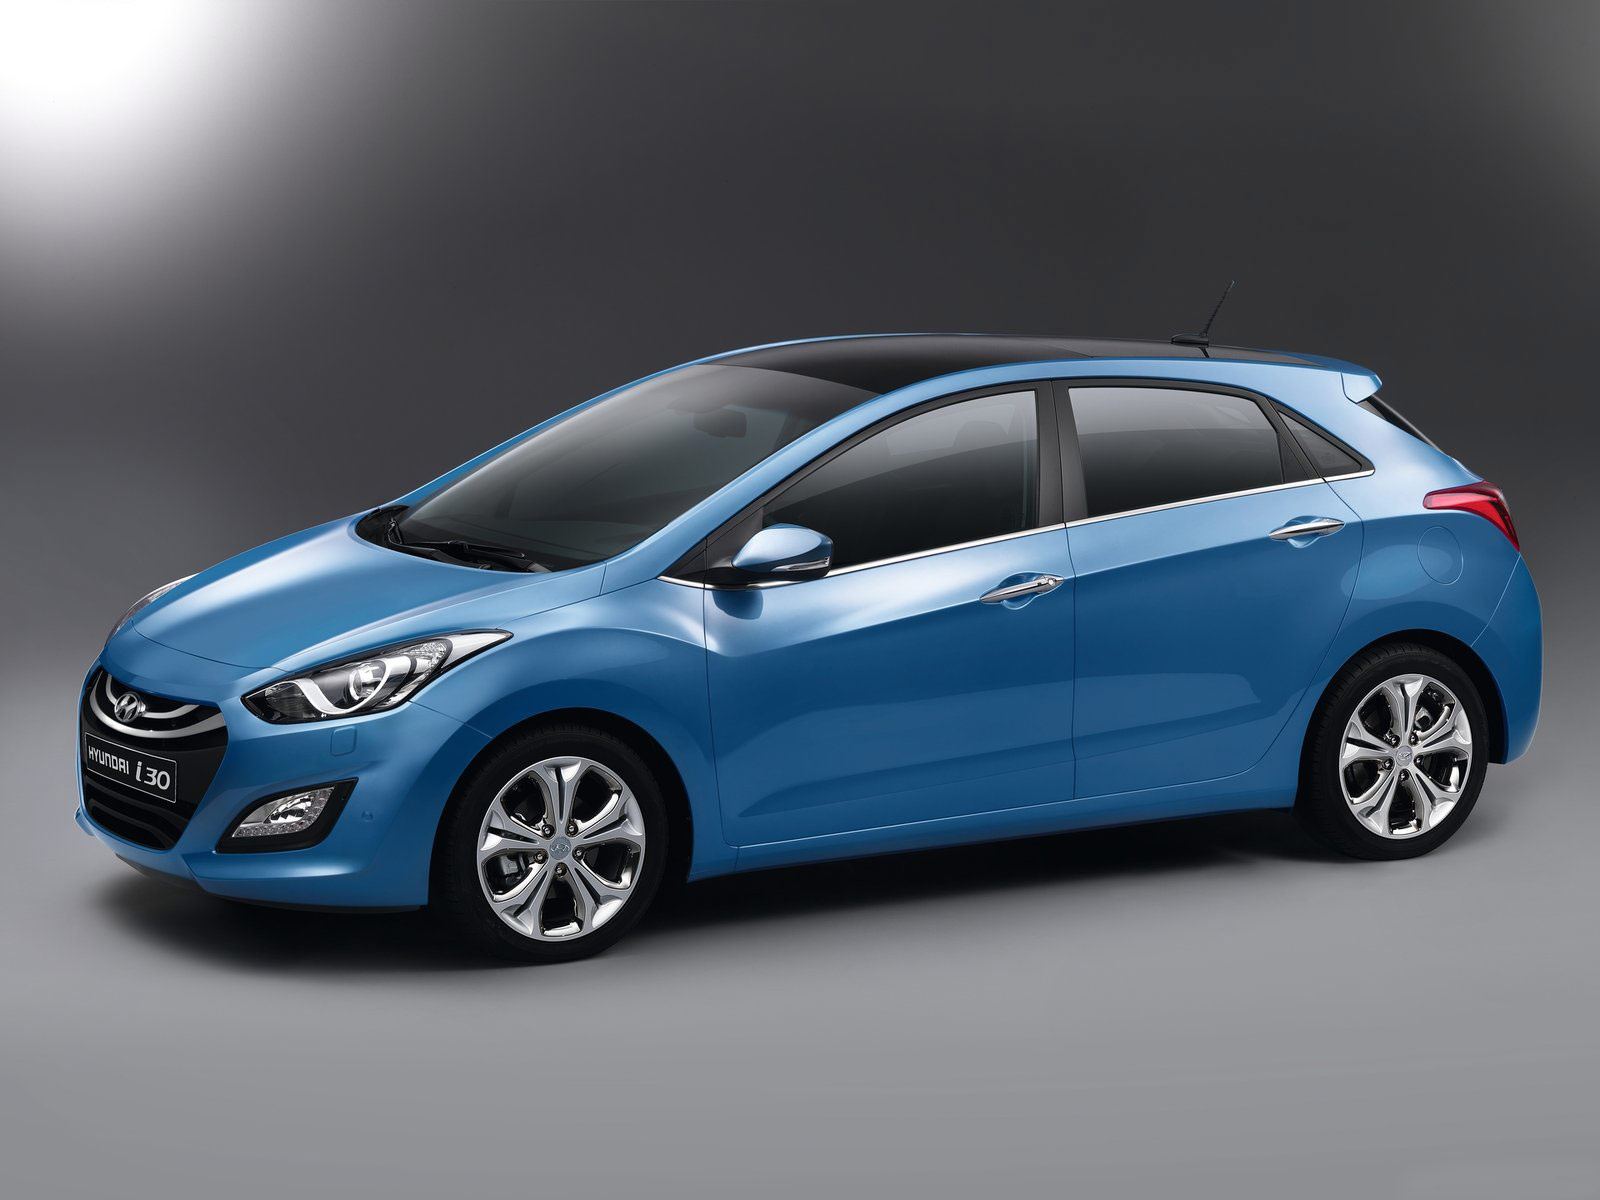 http://2.bp.blogspot.com/-QNfS5vdNZTg/TtccUV8iGRI/AAAAAAAAE9E/Dq9HY6VmGVA/s1600/2013_Hyundai-i30_car-desktop-wallpaper_4.jpg